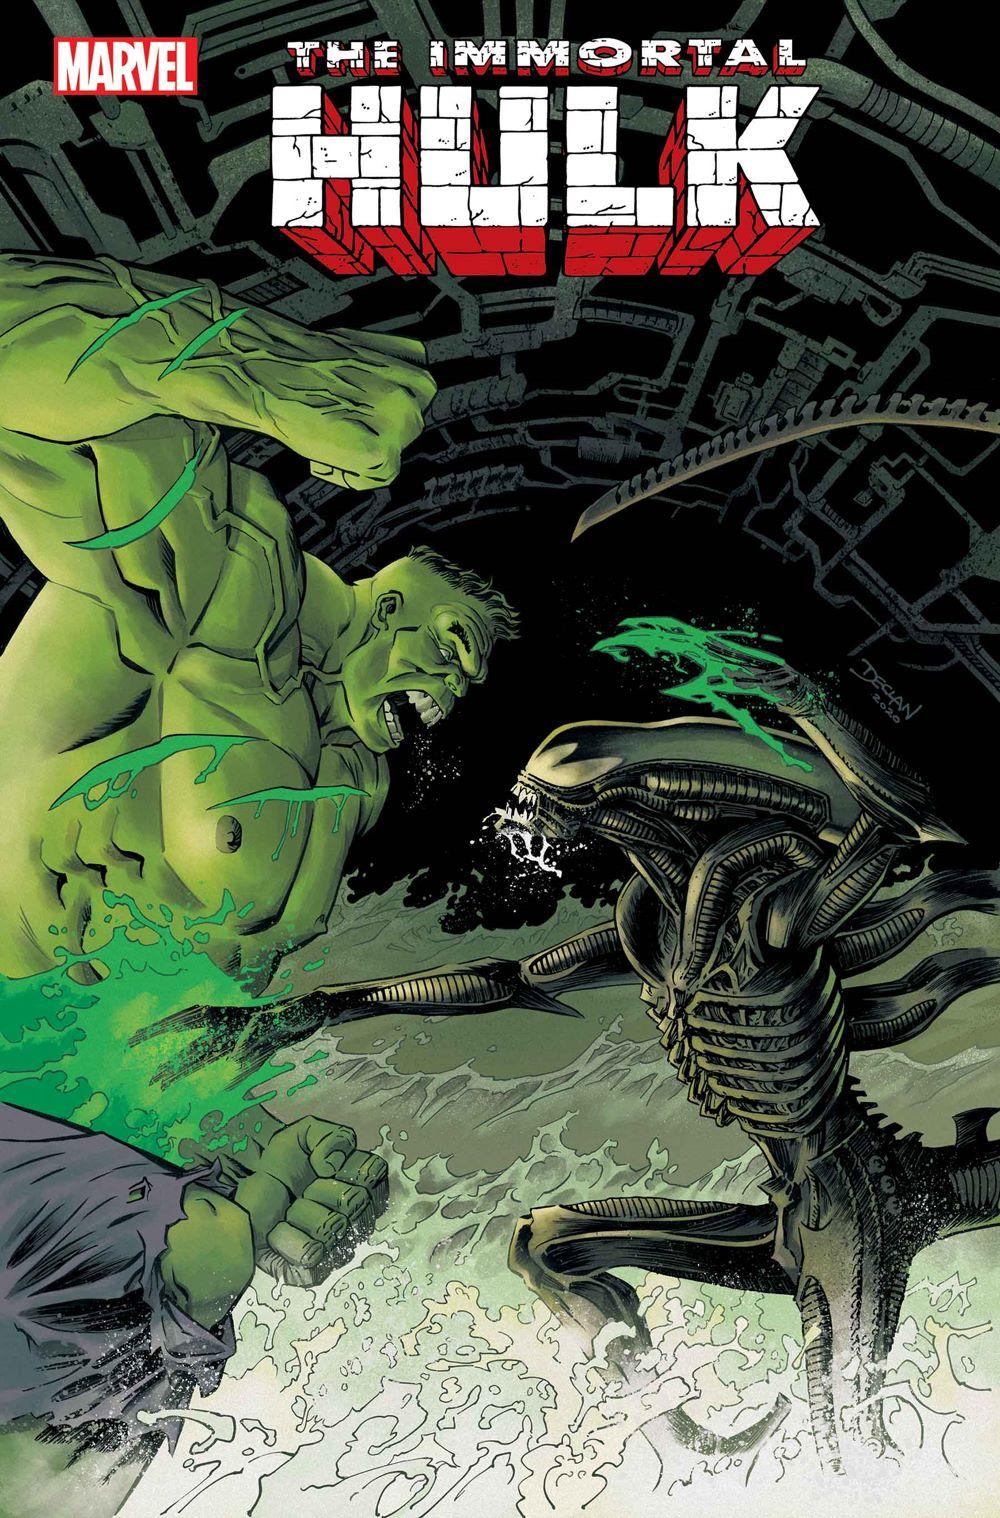 HULK2018043_ShalveyVar Marvel Comics January 2021 Solicitations